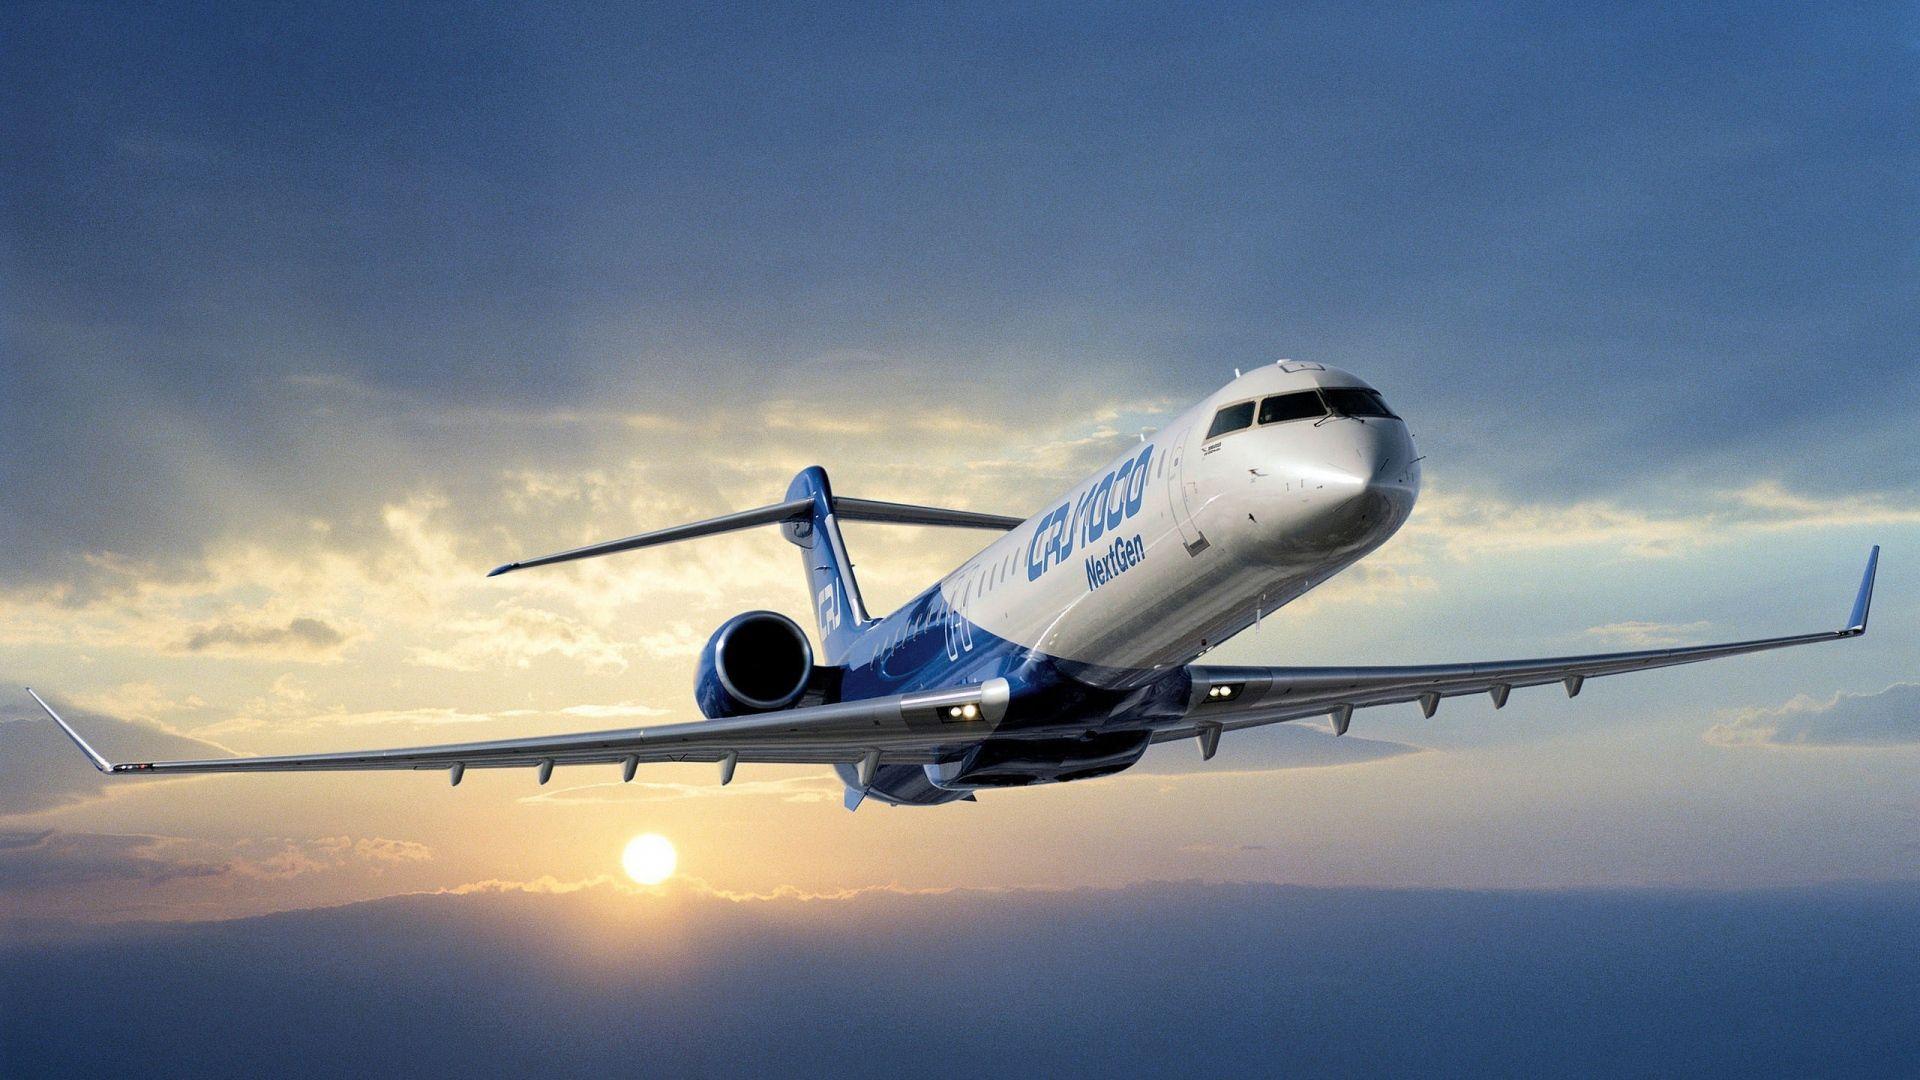 The Latest Aviation Wallpaper